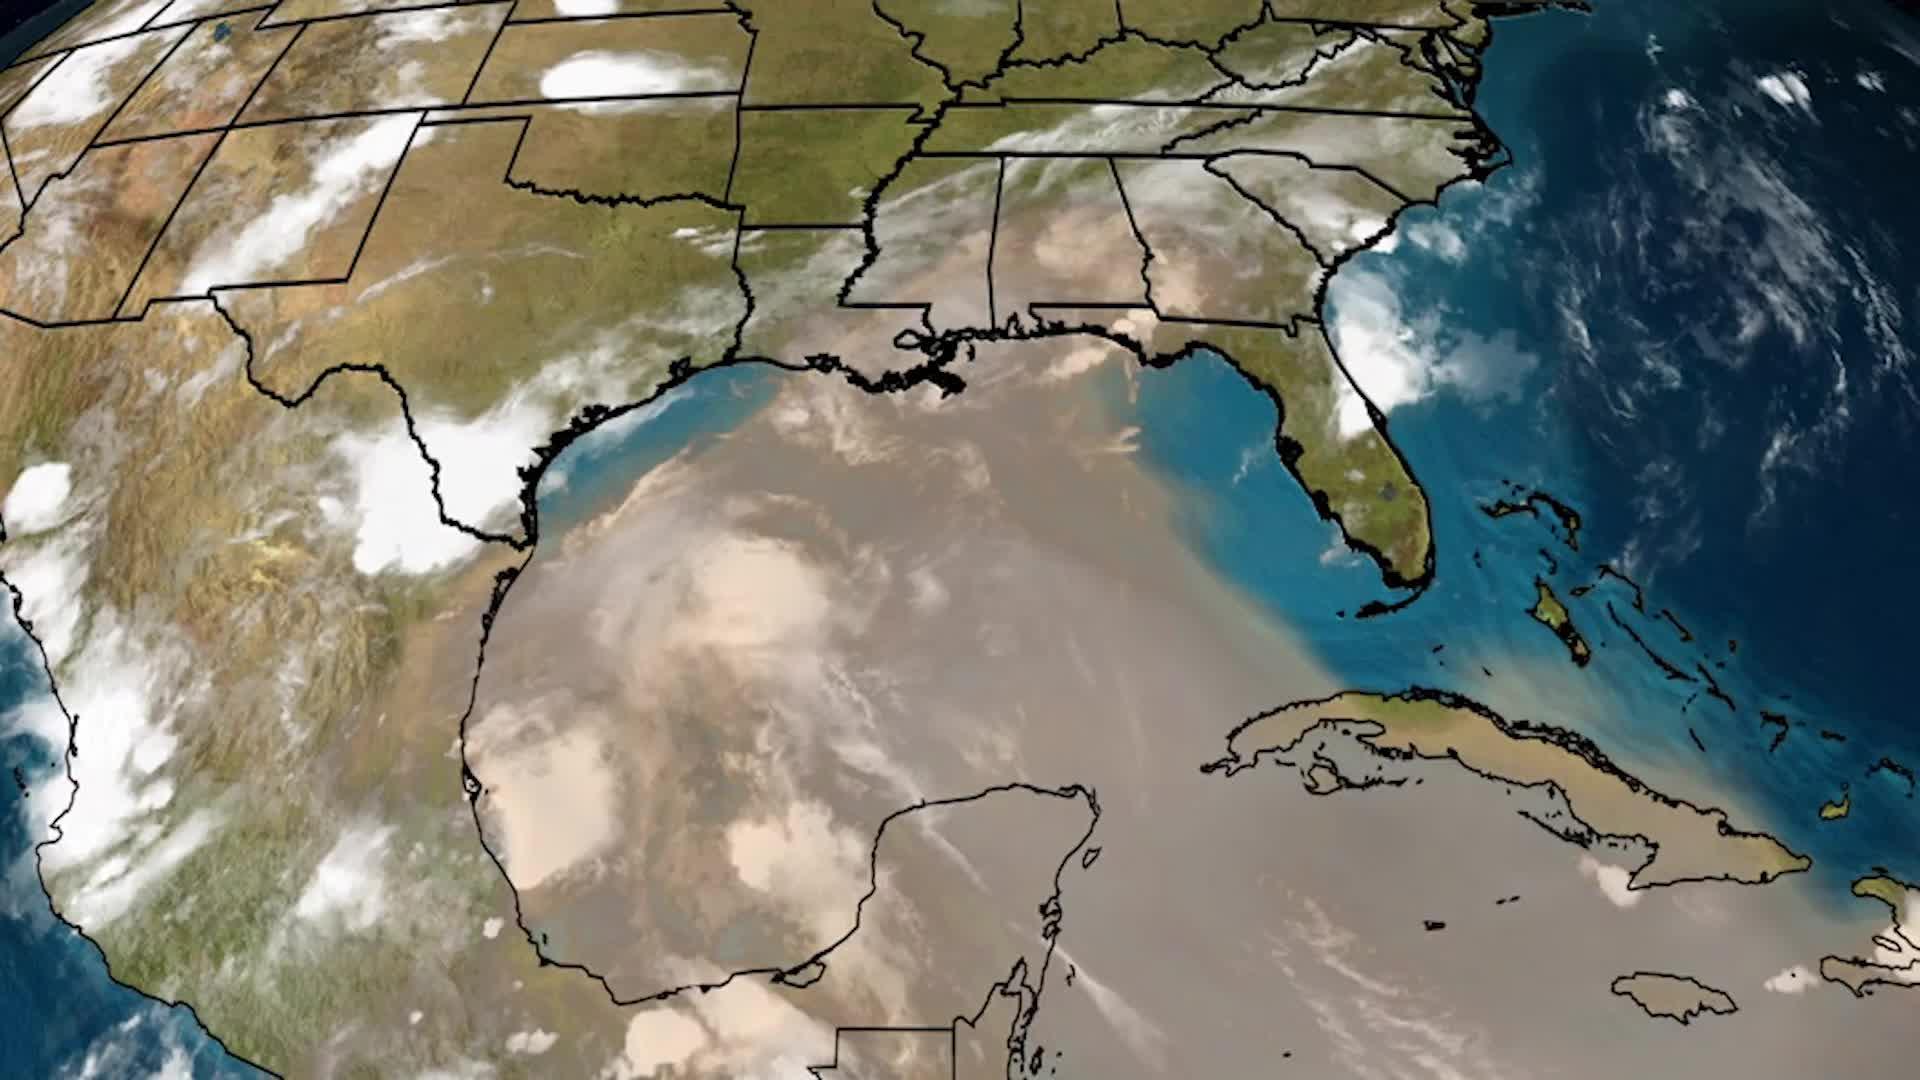 La capa de aire sahariana invade la costa del golfo